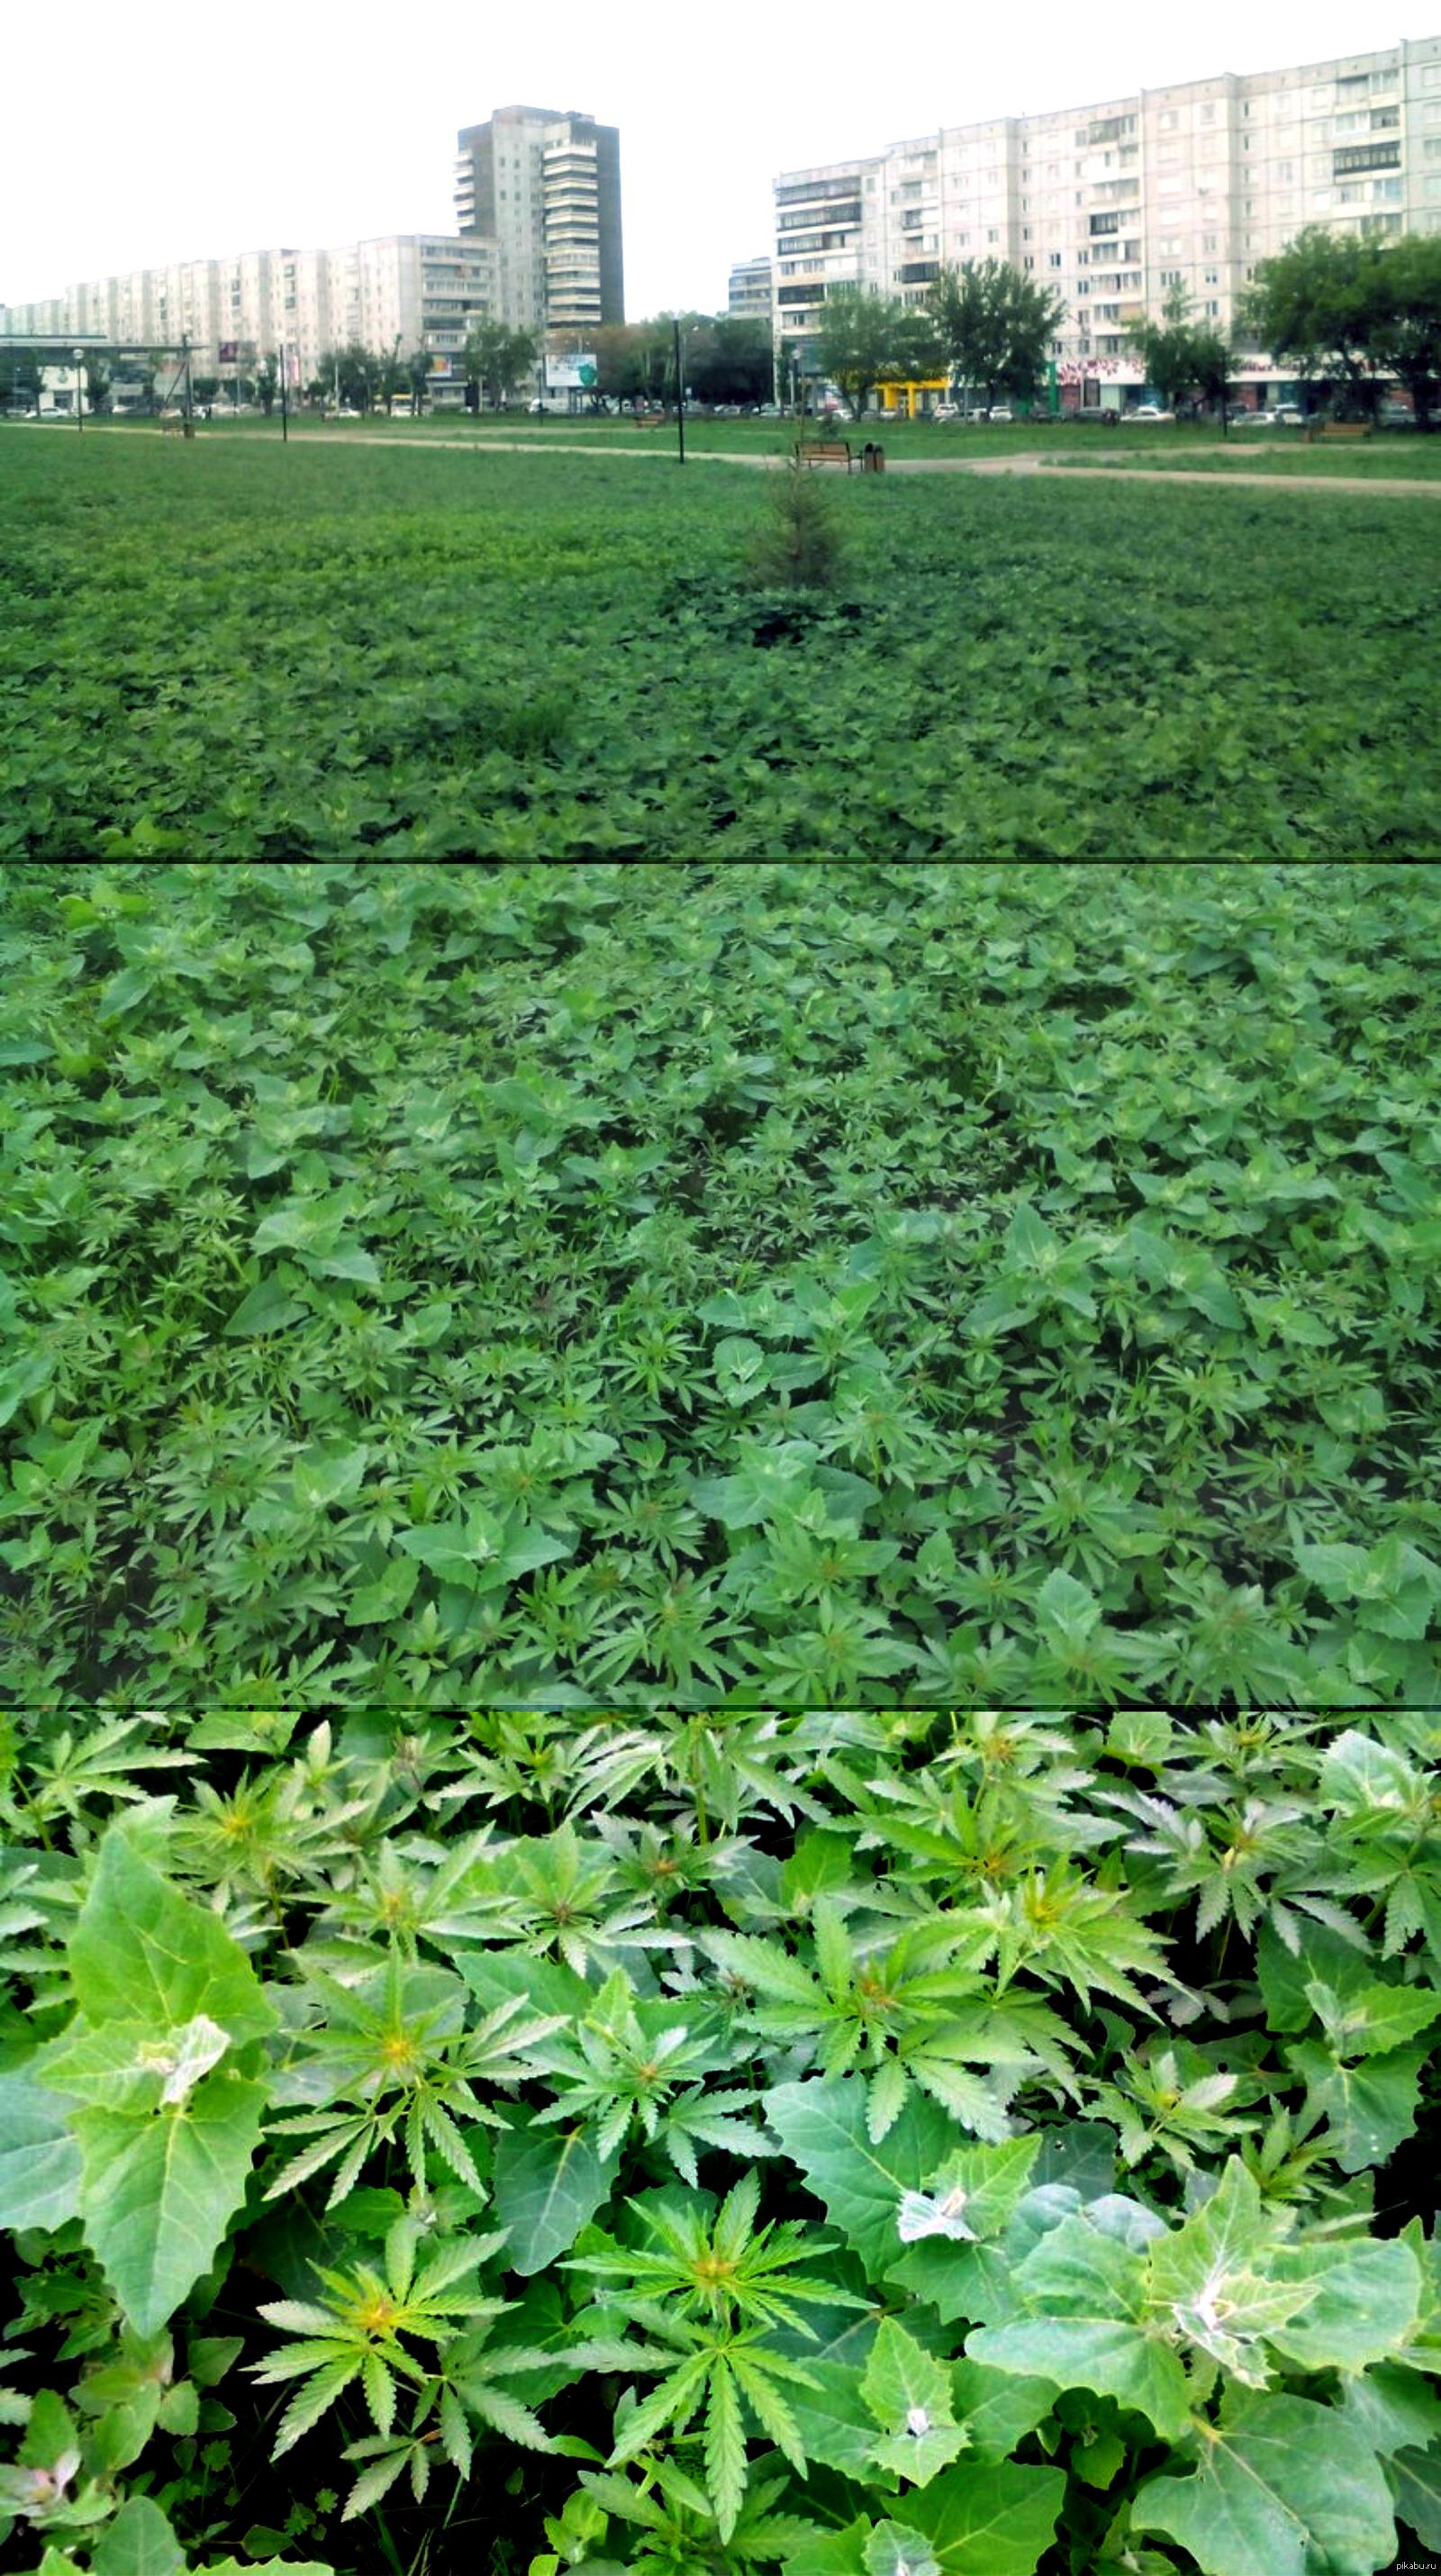 Где растет конопля в красноярске много конопли фото